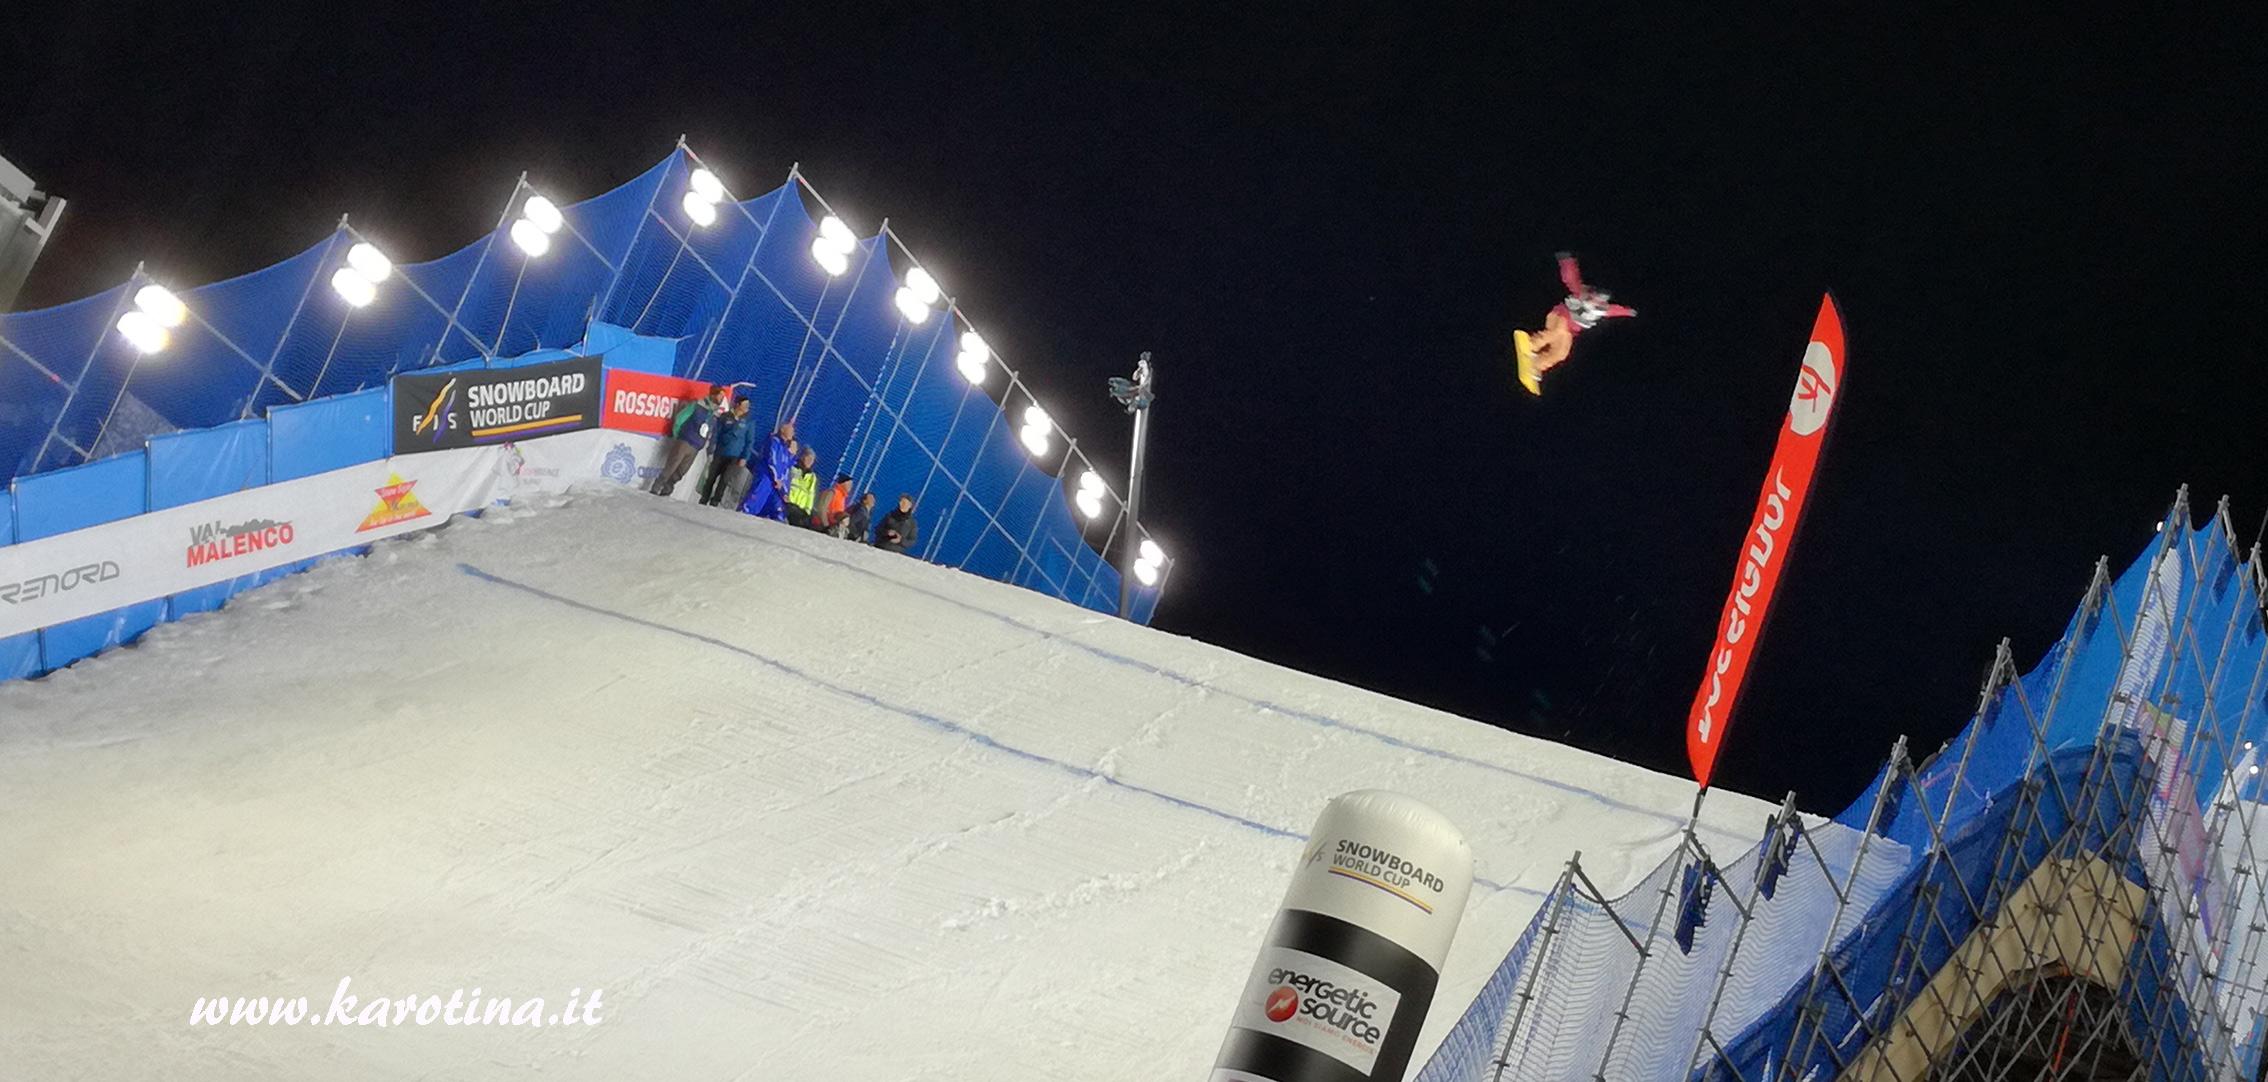 2016 11 14 snowboard expo milano karotina blog blogger neve